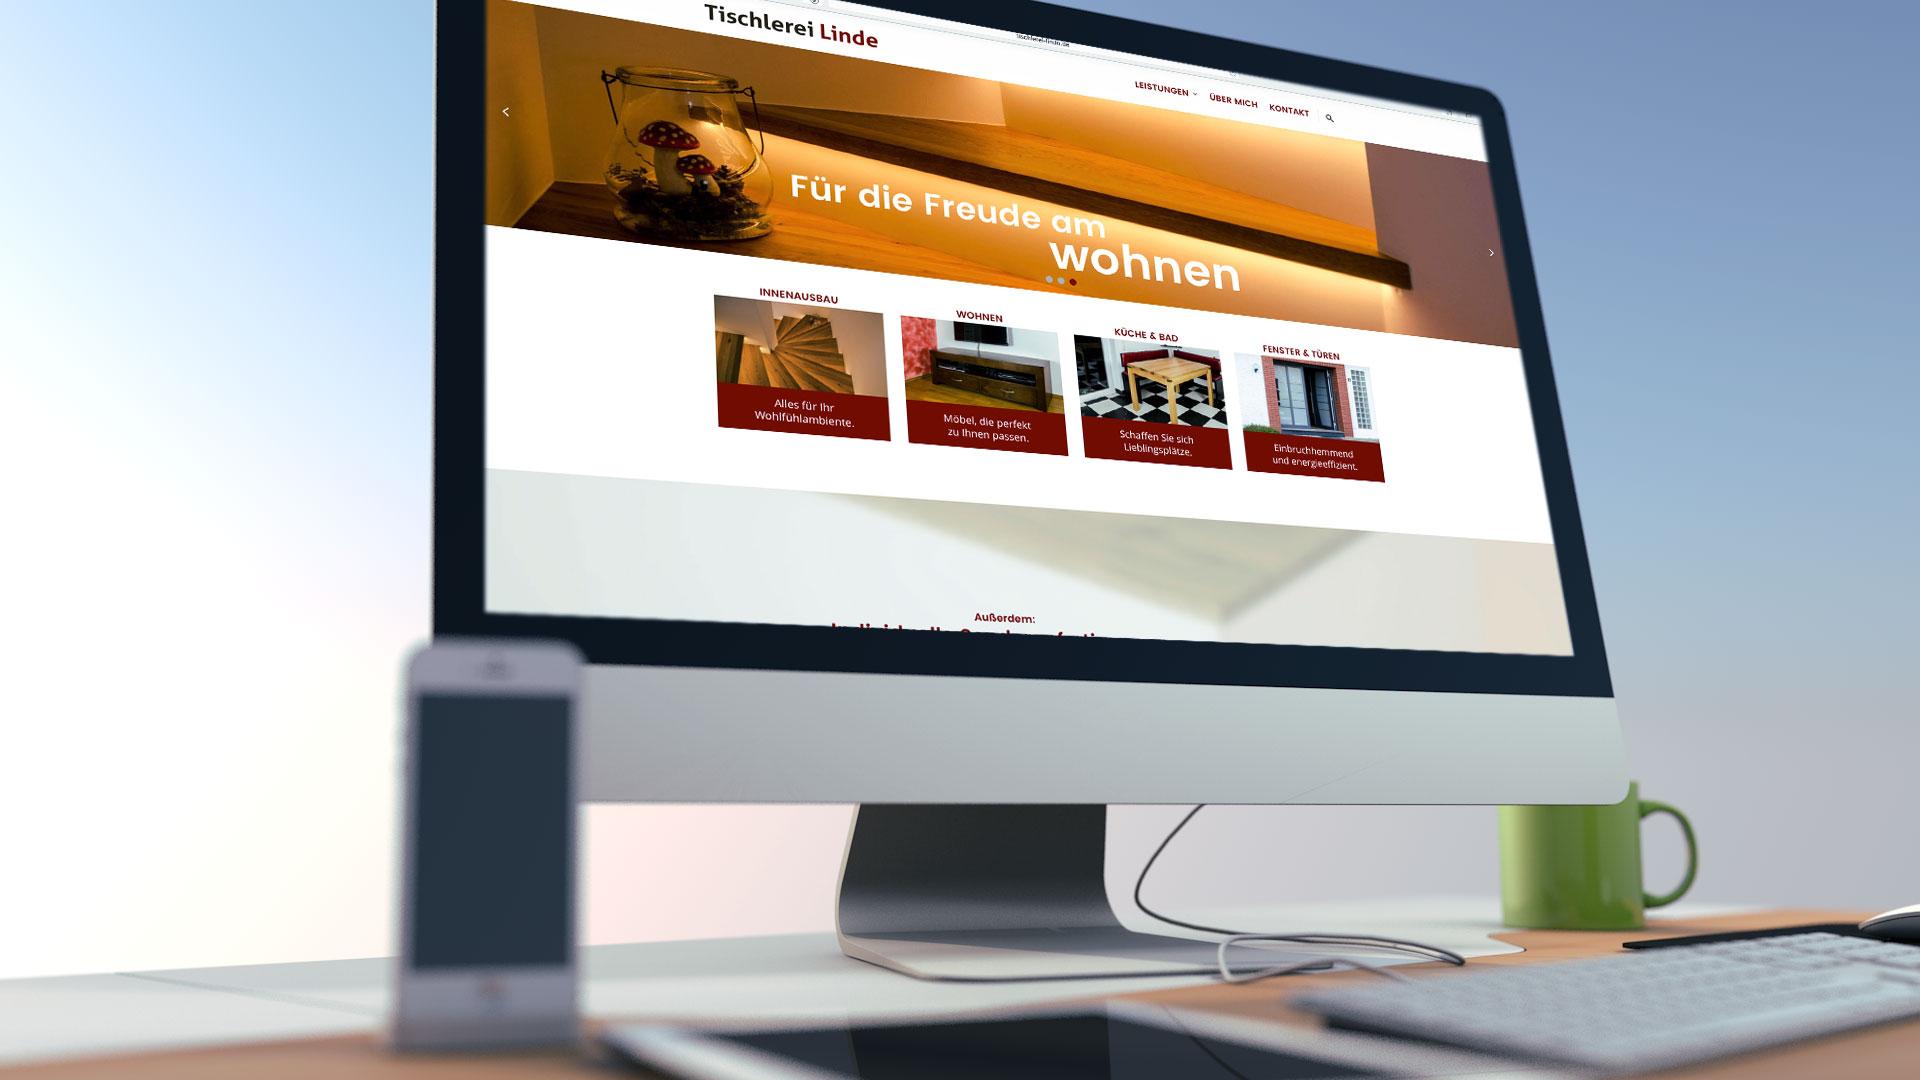 Tischlerei linde webauftritt screendesign for Tischlerei herford